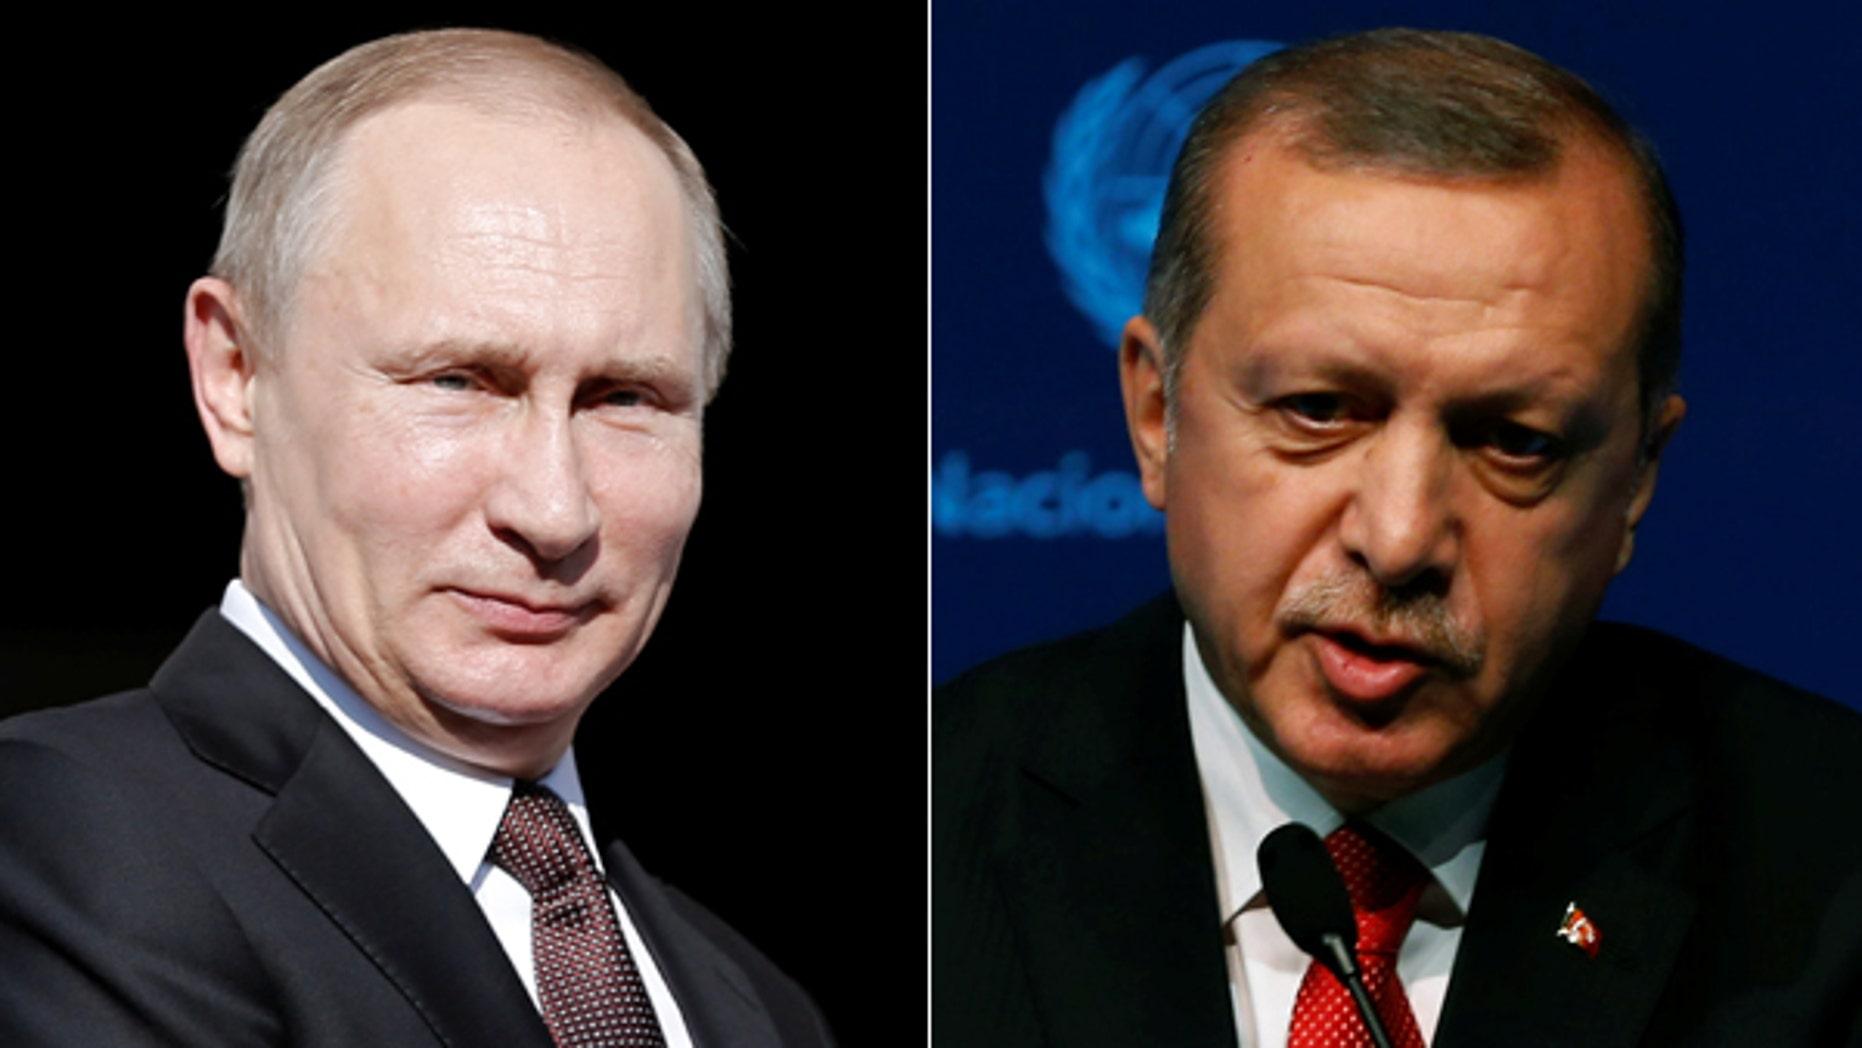 Russian President Vladimir Putin, left, and Turkish President Recep Tayyip Erdogan.